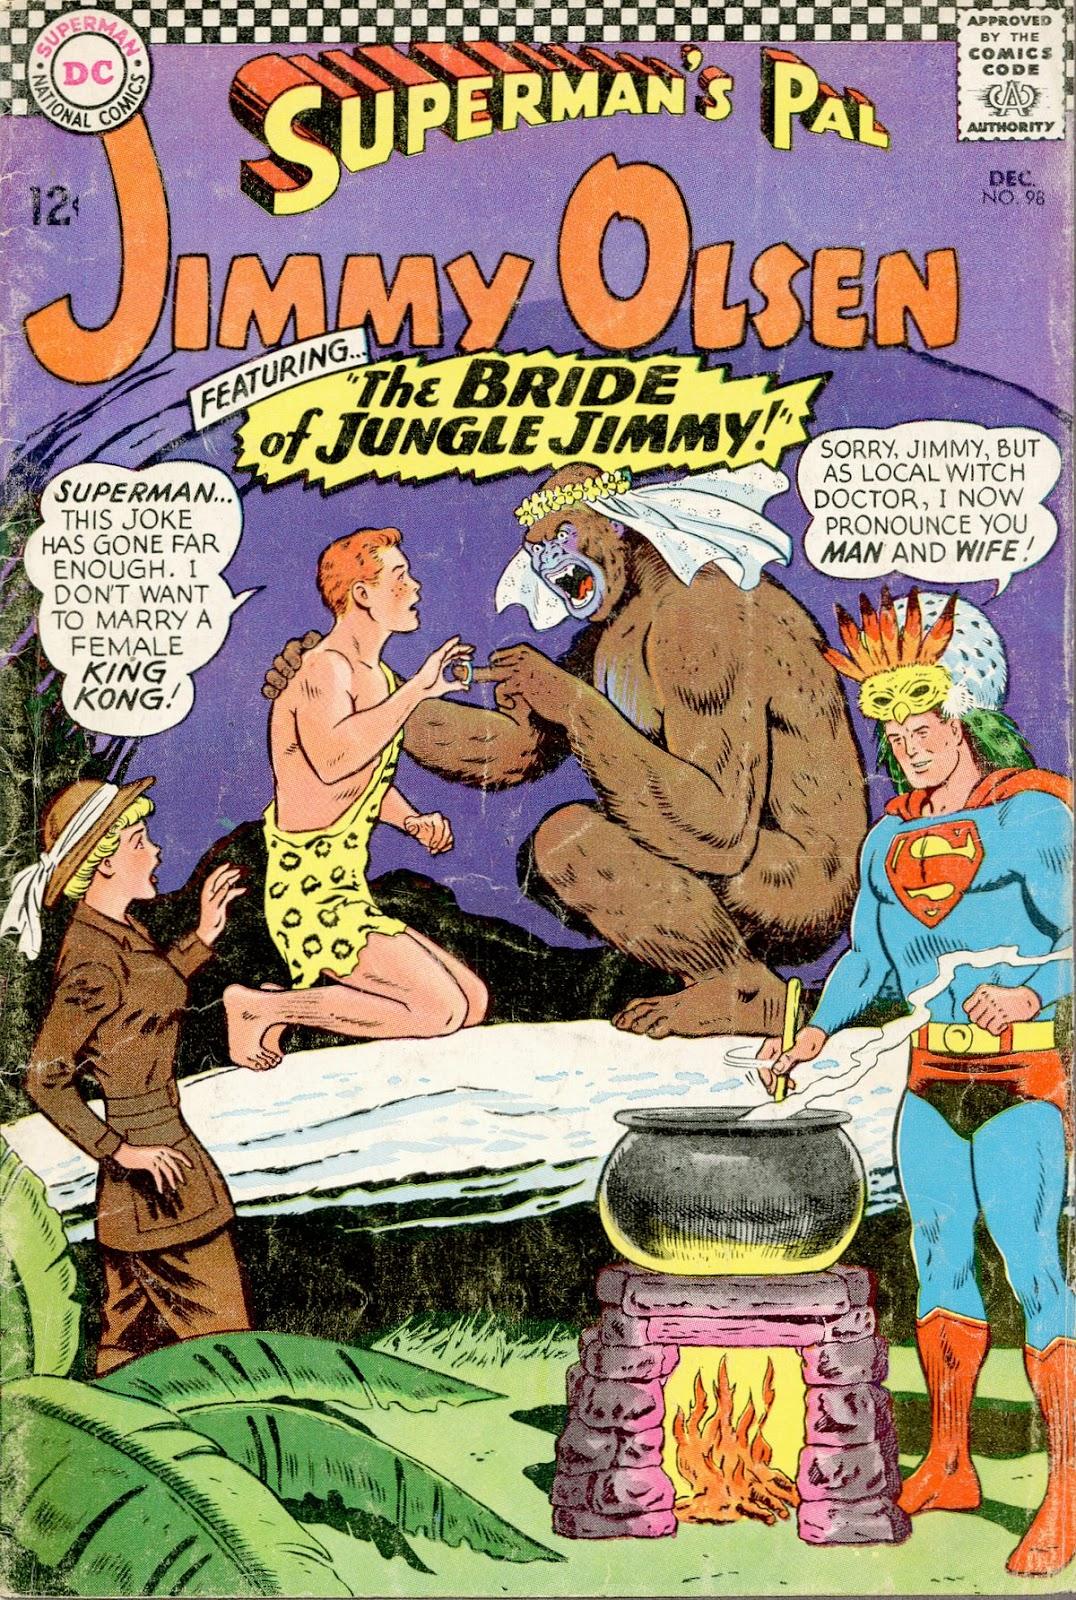 Supermans Pal Jimmy Olsen (1954) 98 Page 1